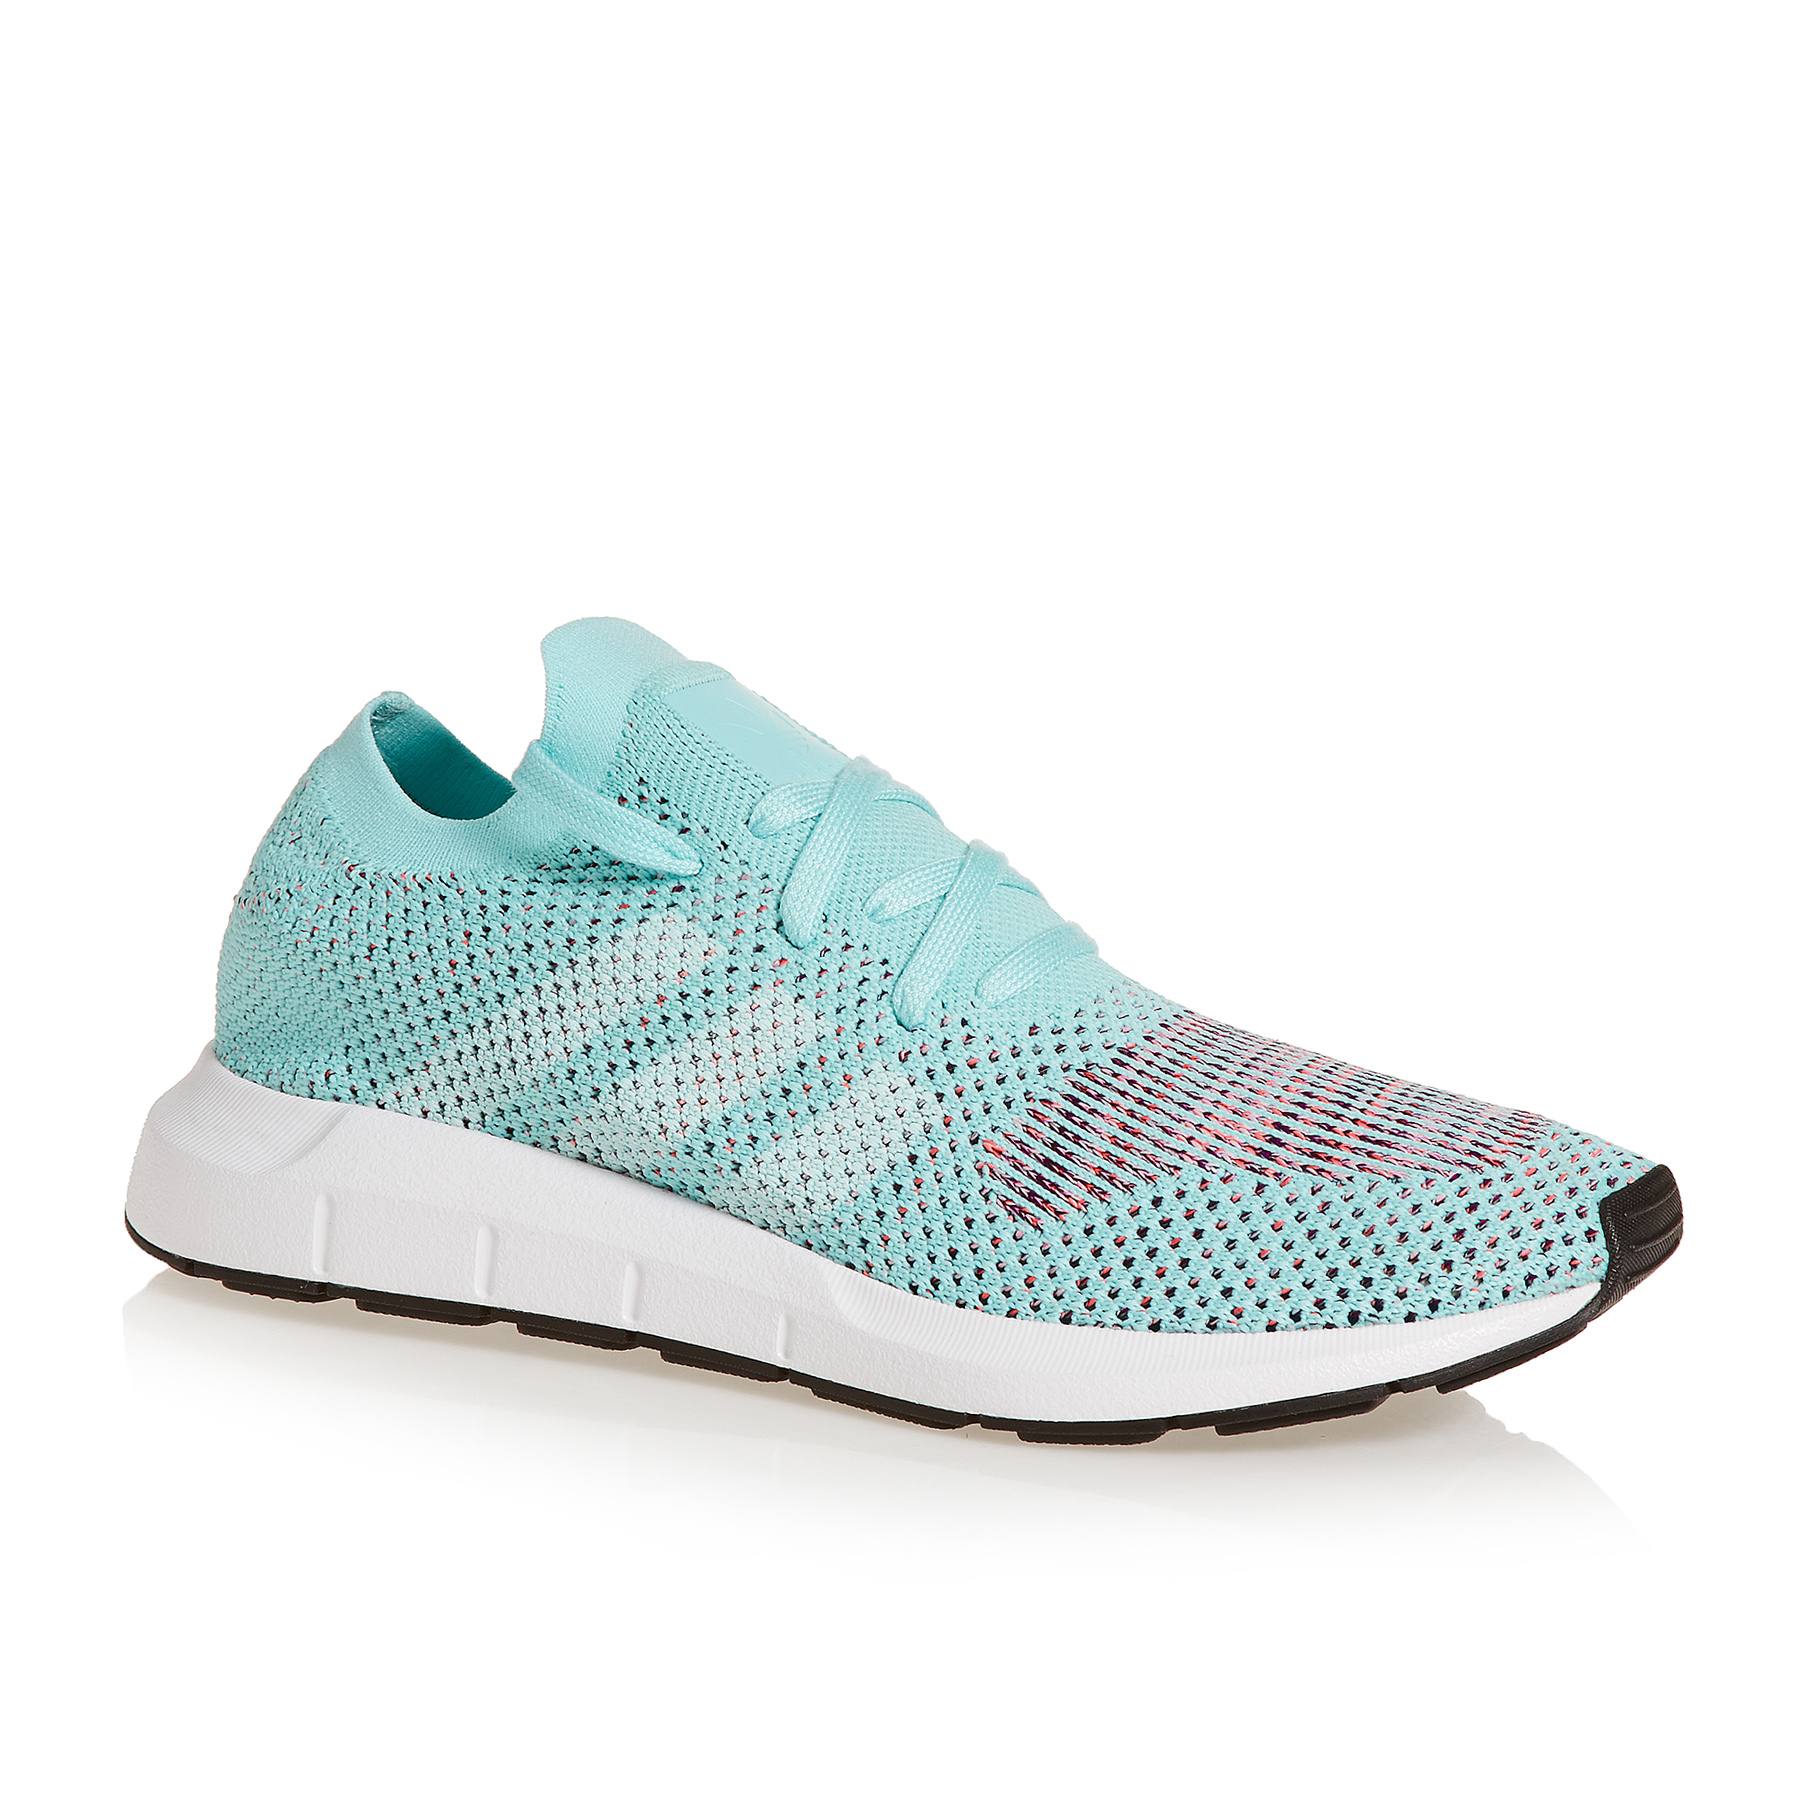 Adidas Originals Swift Run Primeknit Womens Shoes   Free